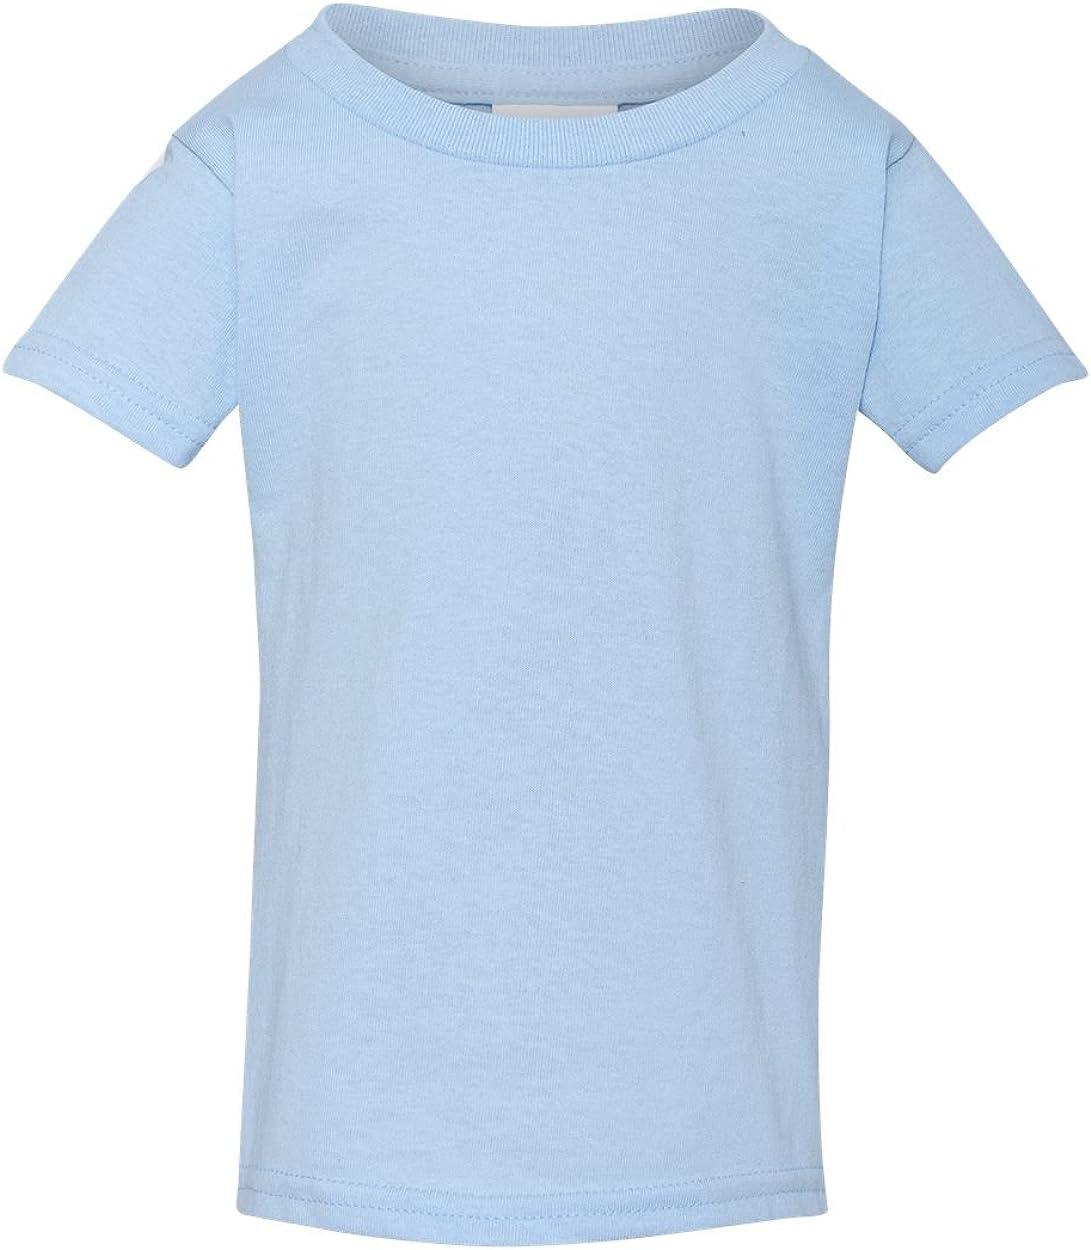 Toddler Heavy Cotton 5.3 oz T-Shirt LIGHT BLUE 4T